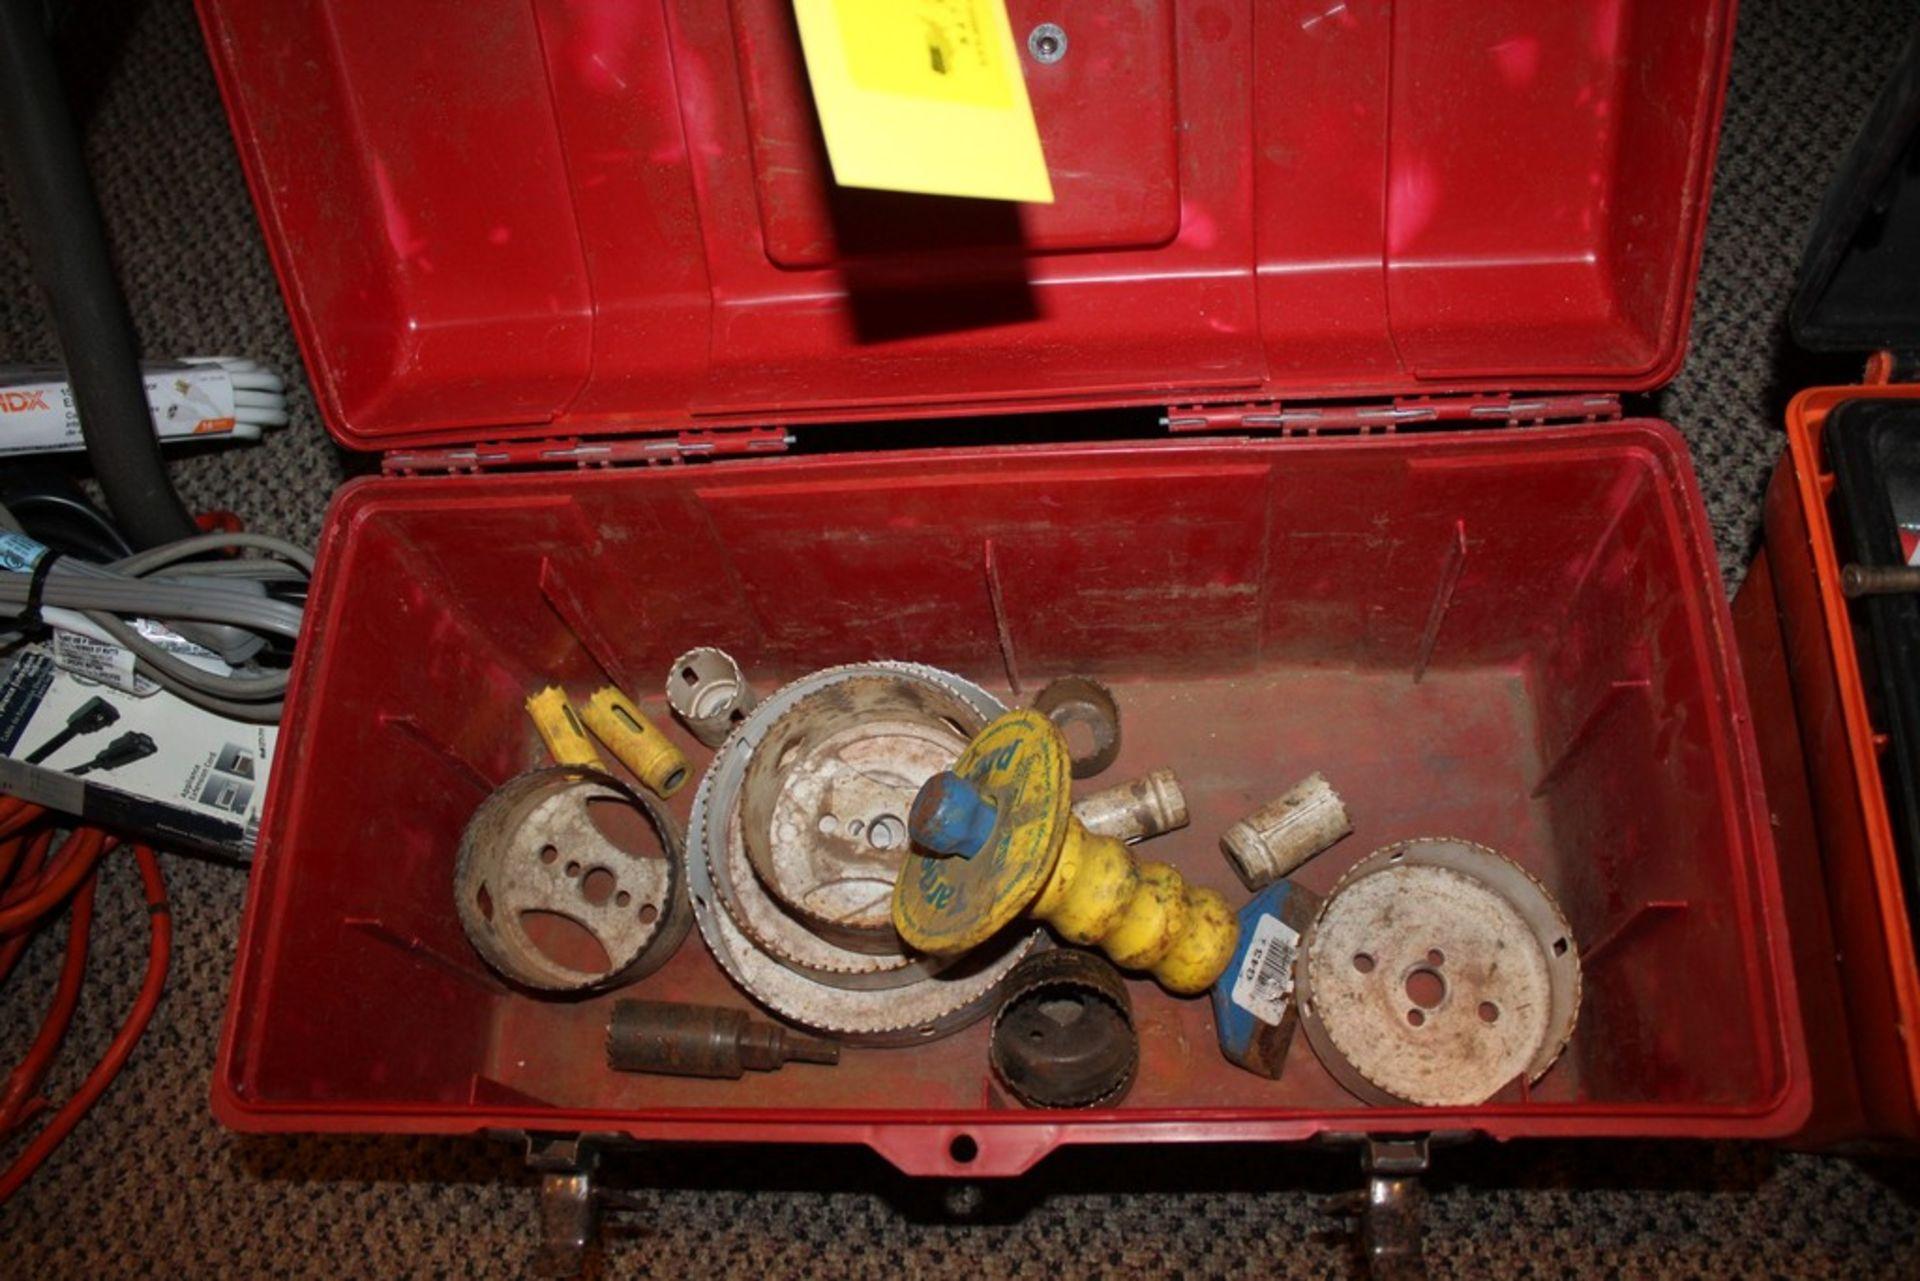 Lot 9 - LARGE MASONRY, BORING BITS AND HOLE SAWS IN TOOL BOX